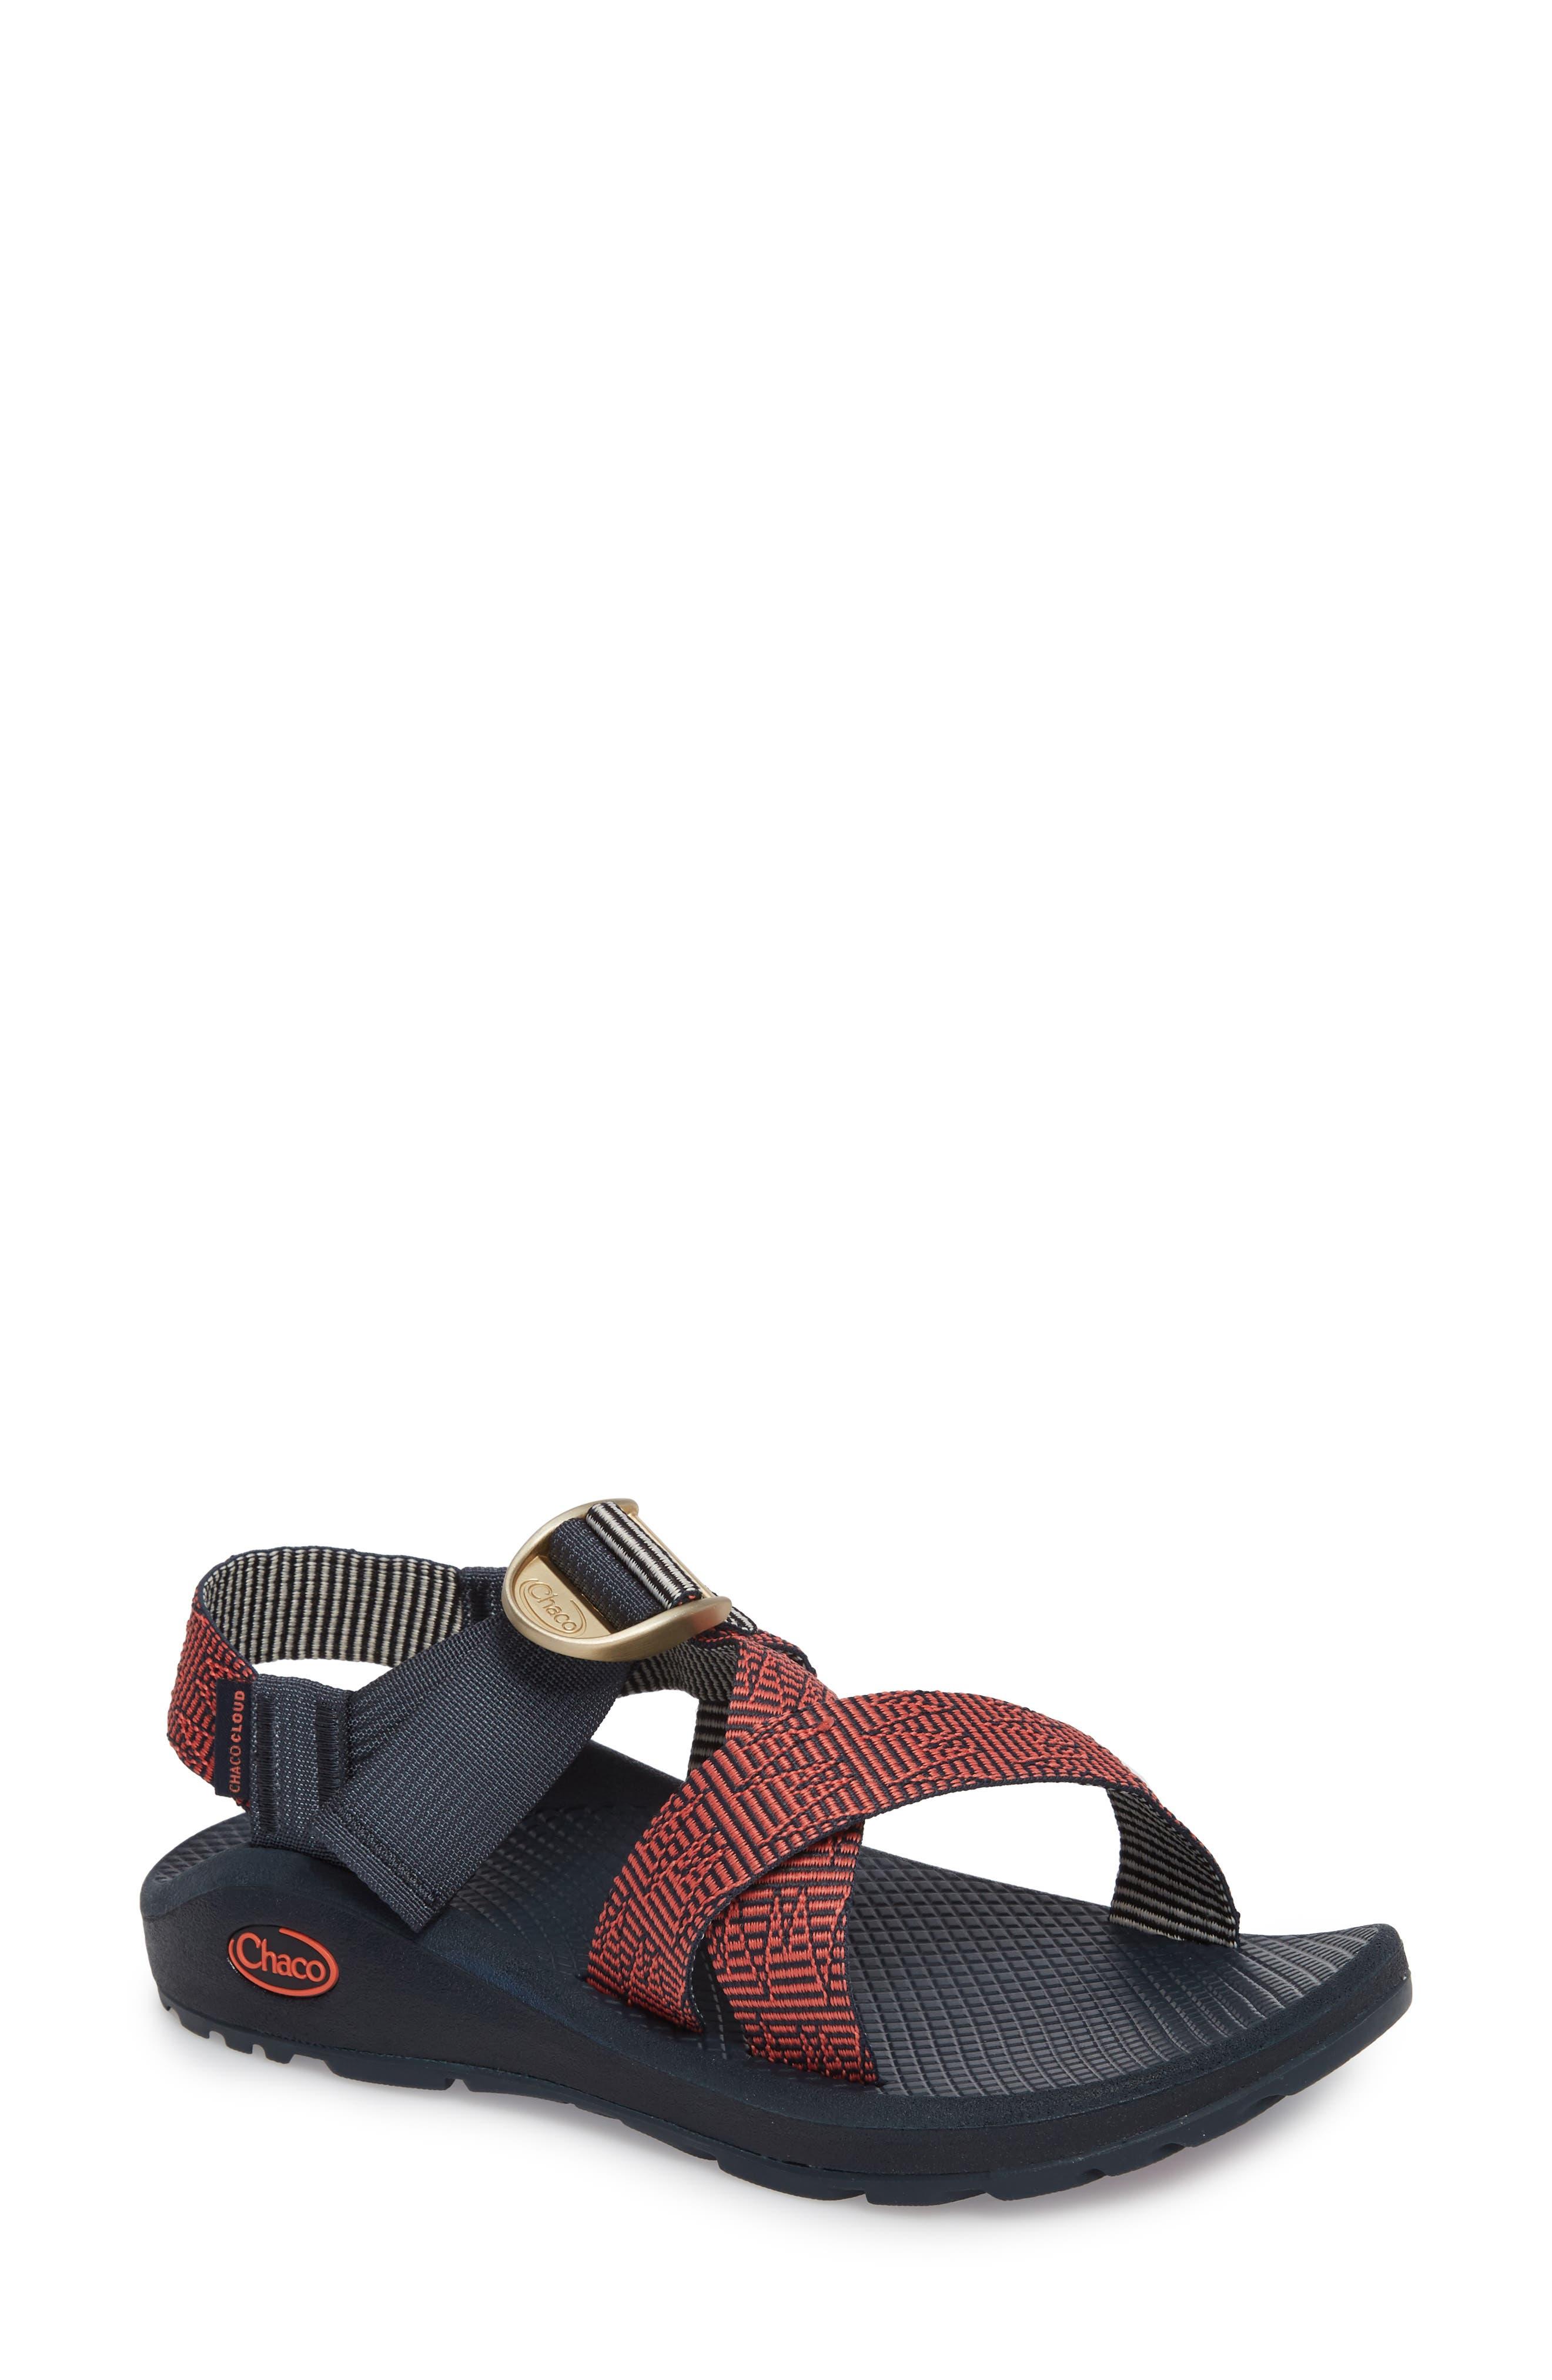 Mega Z/Cloud Sport Sandal,                         Main,                         color, BLAZER NAVY